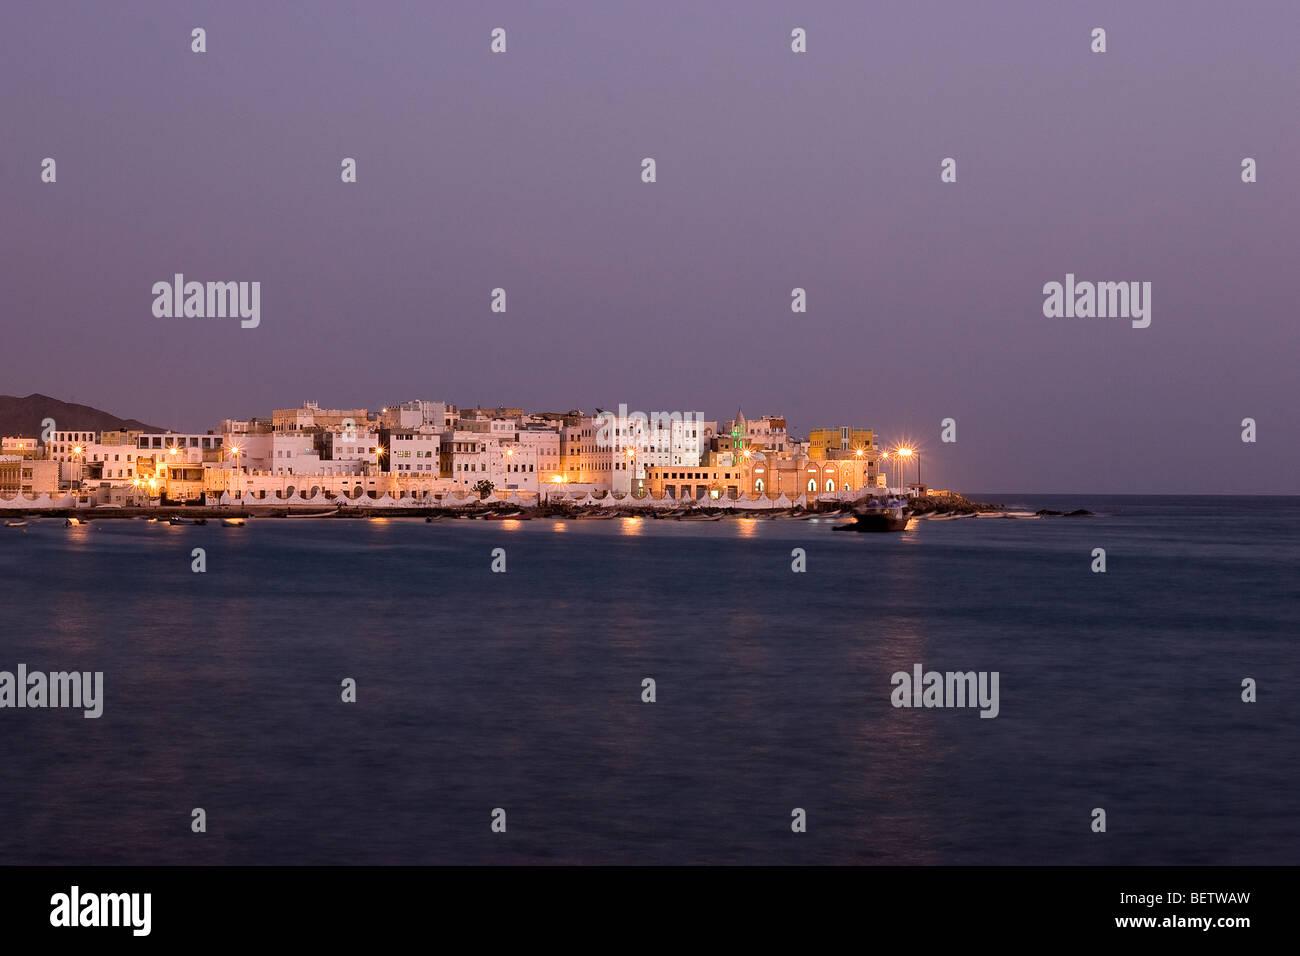 Panoramic view at dusk, Al-Mukalla, Yemen - Stock Image